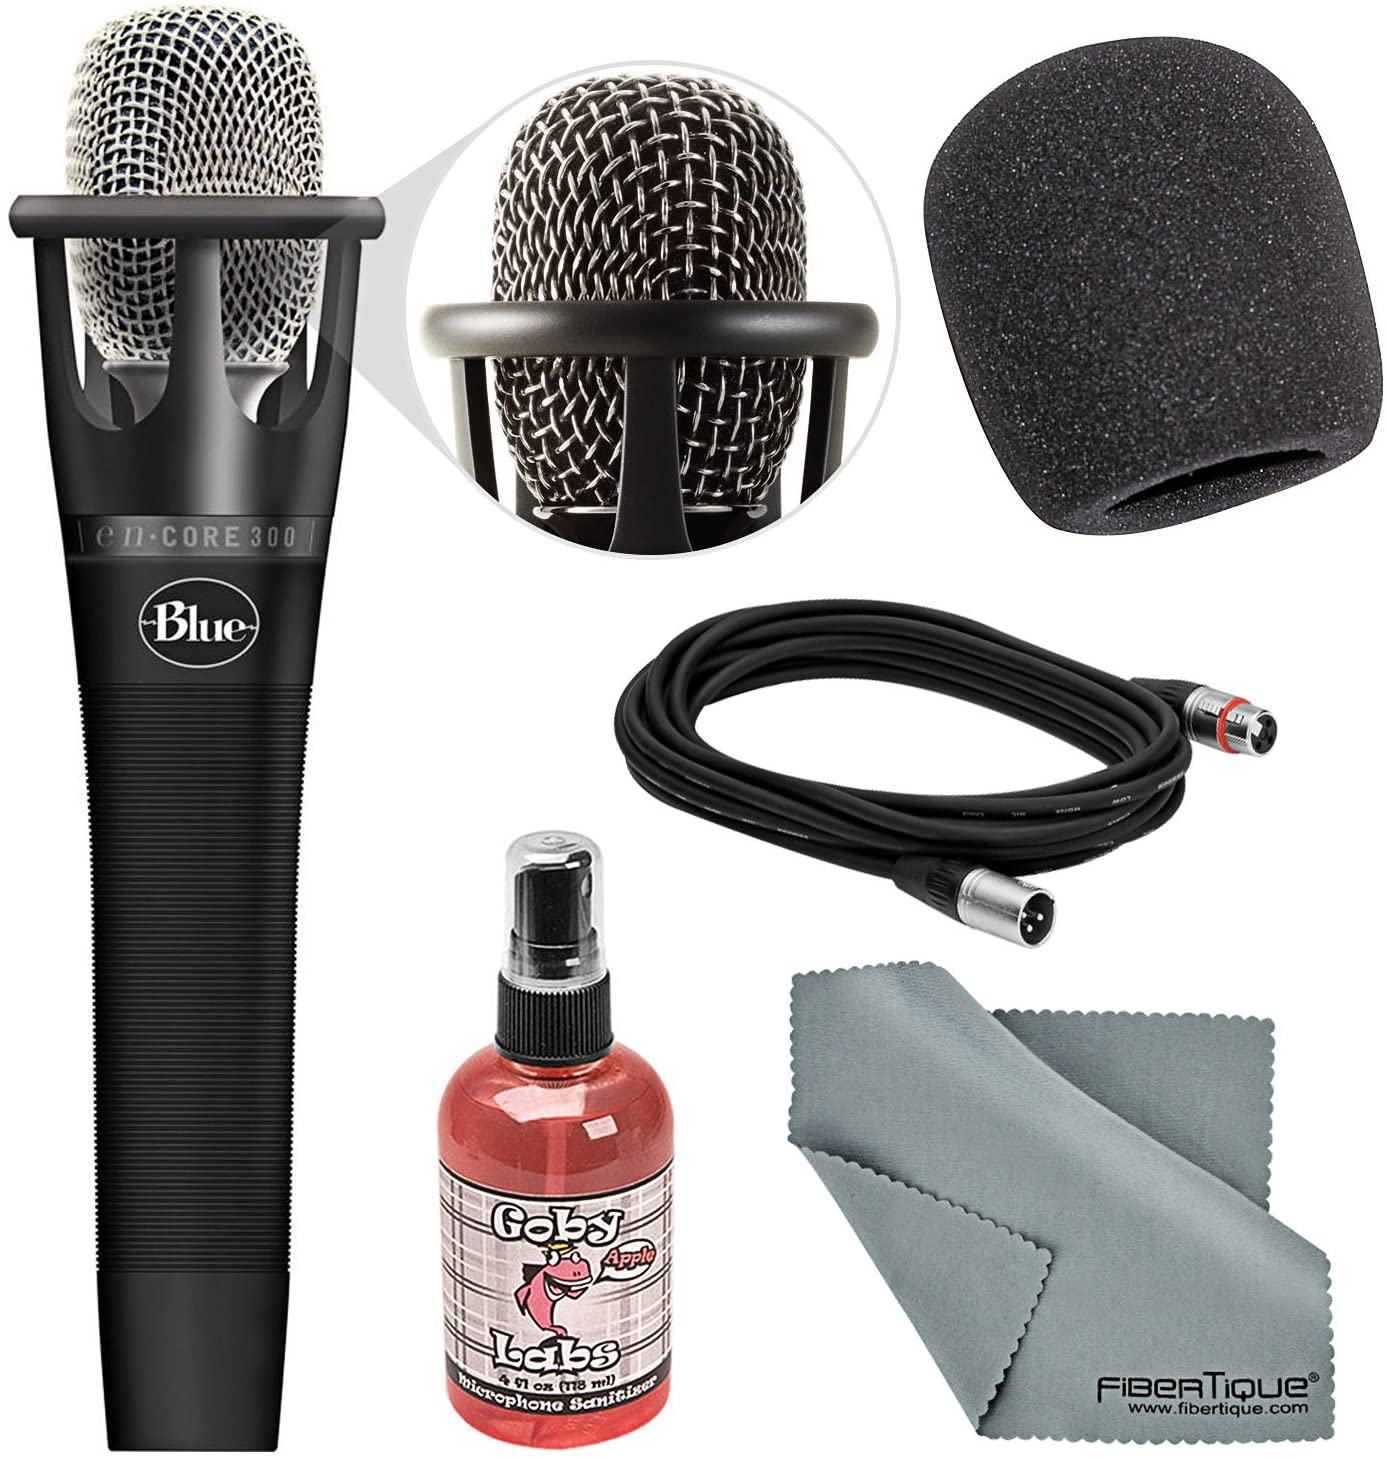 Blue Encore 300 Condenser Handheld Cardioid Microphone with Windscreen+Sanitizer+Cable+Fibertique Cloth Bundle